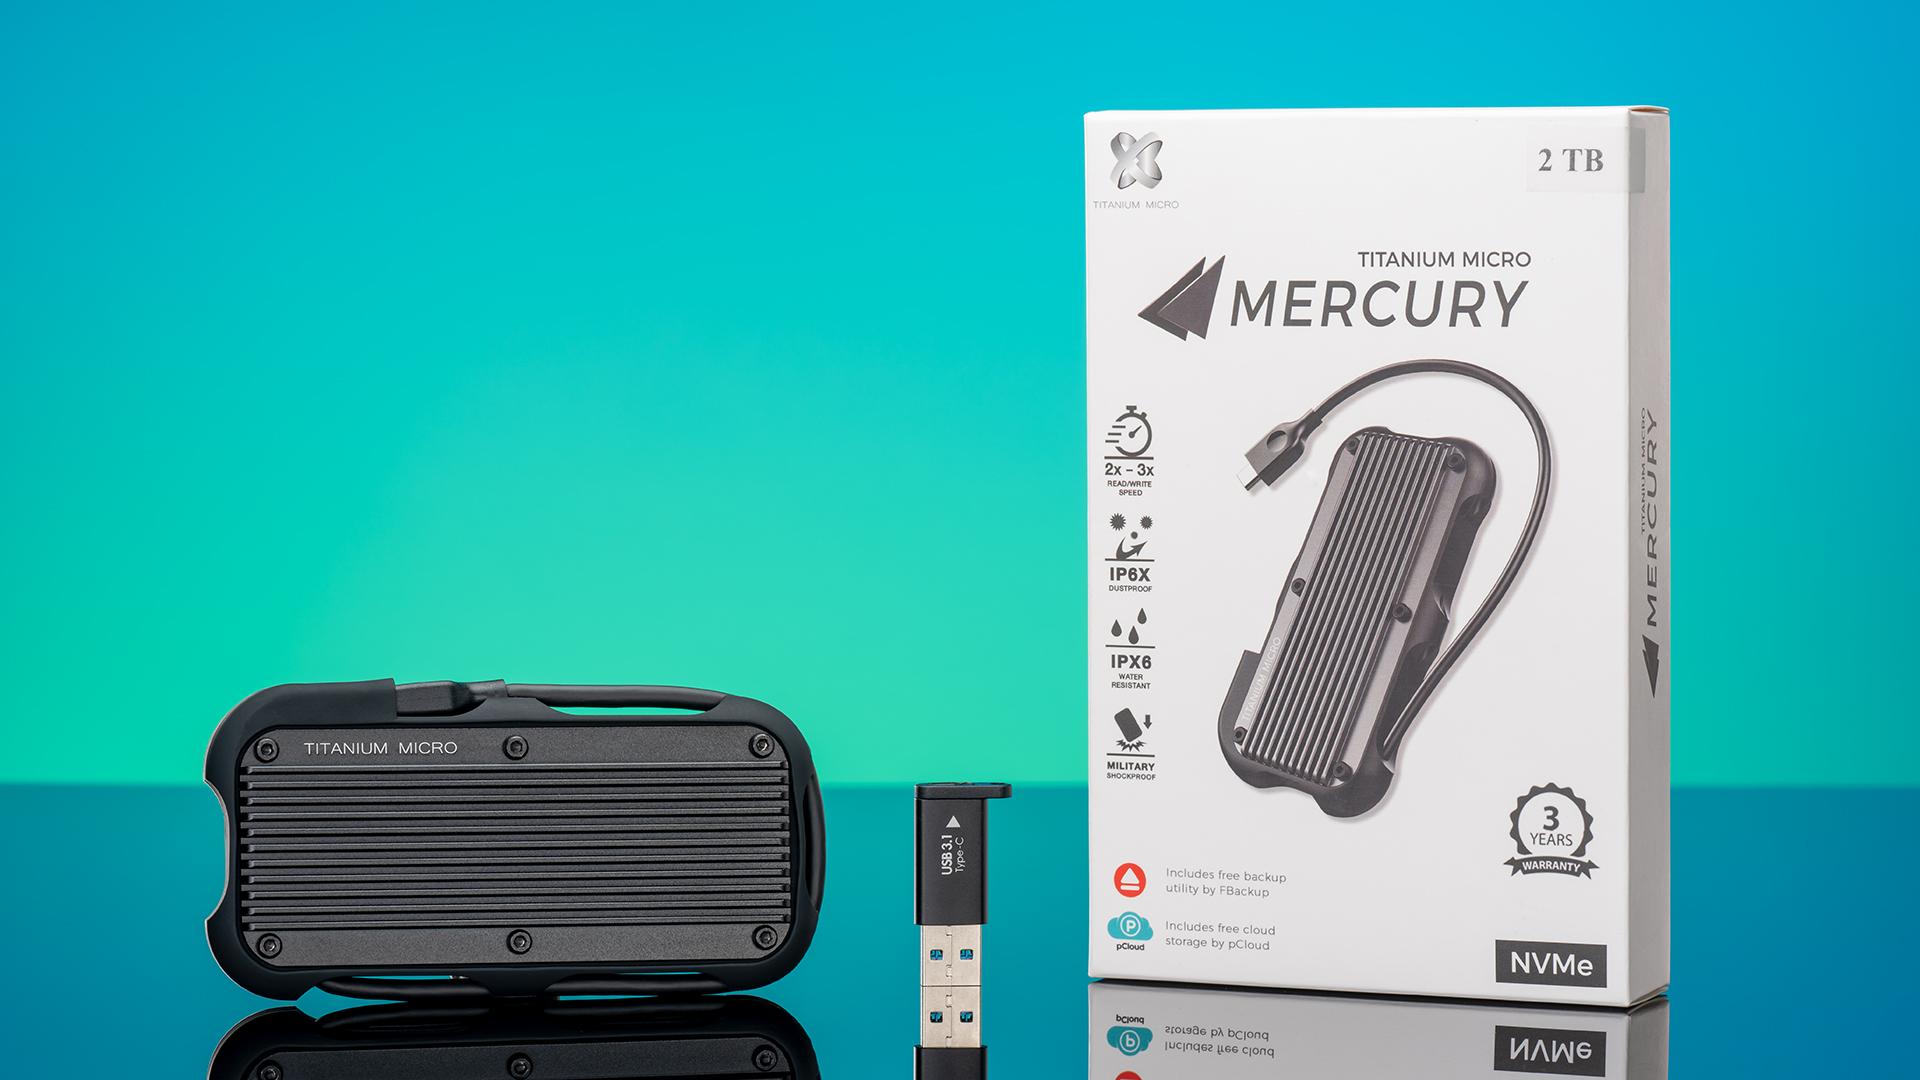 Titanium Micro Mercury: A portable external SSD built like a tank